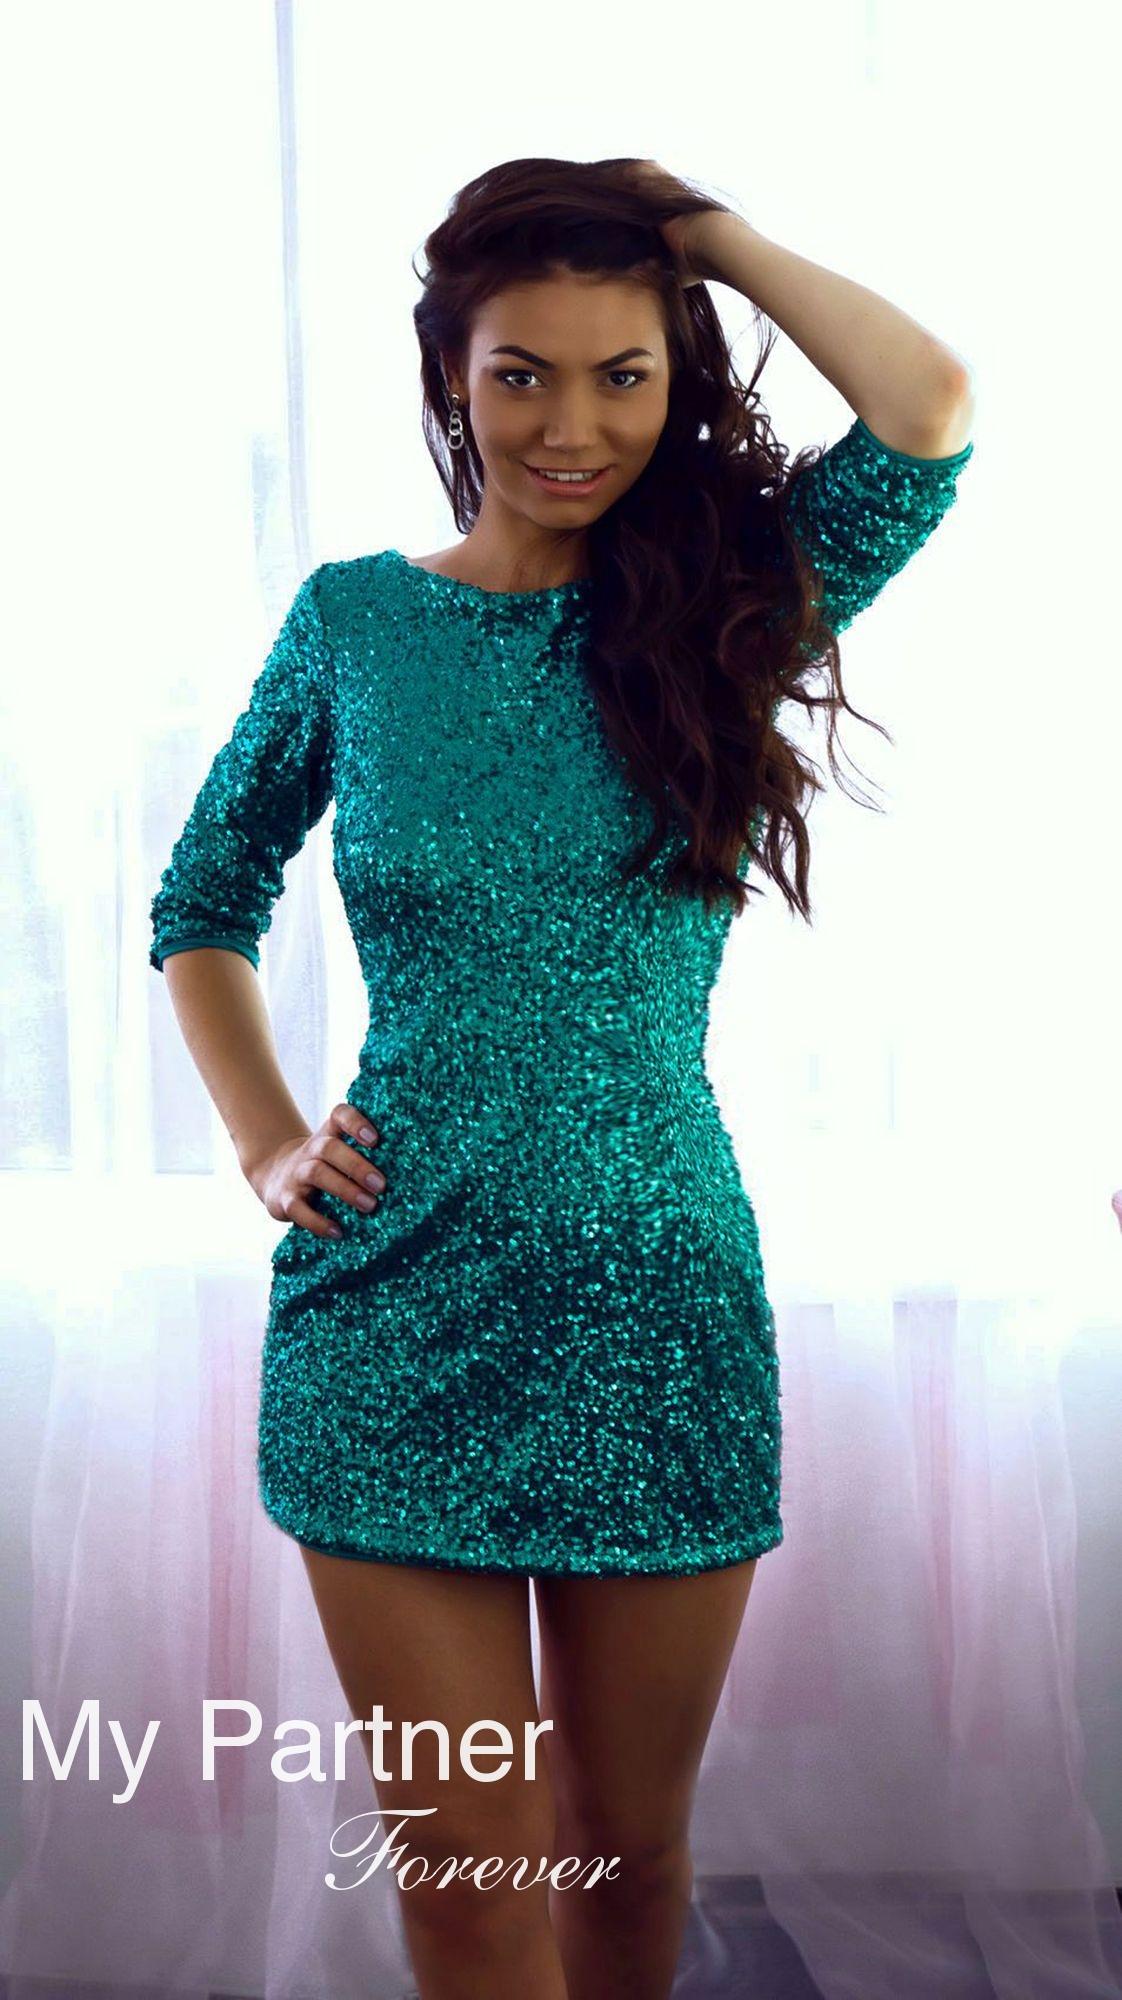 Datingsite to Meet Charming Ukrainian Girl Irina from Dniepropetrovsk, Ukraine